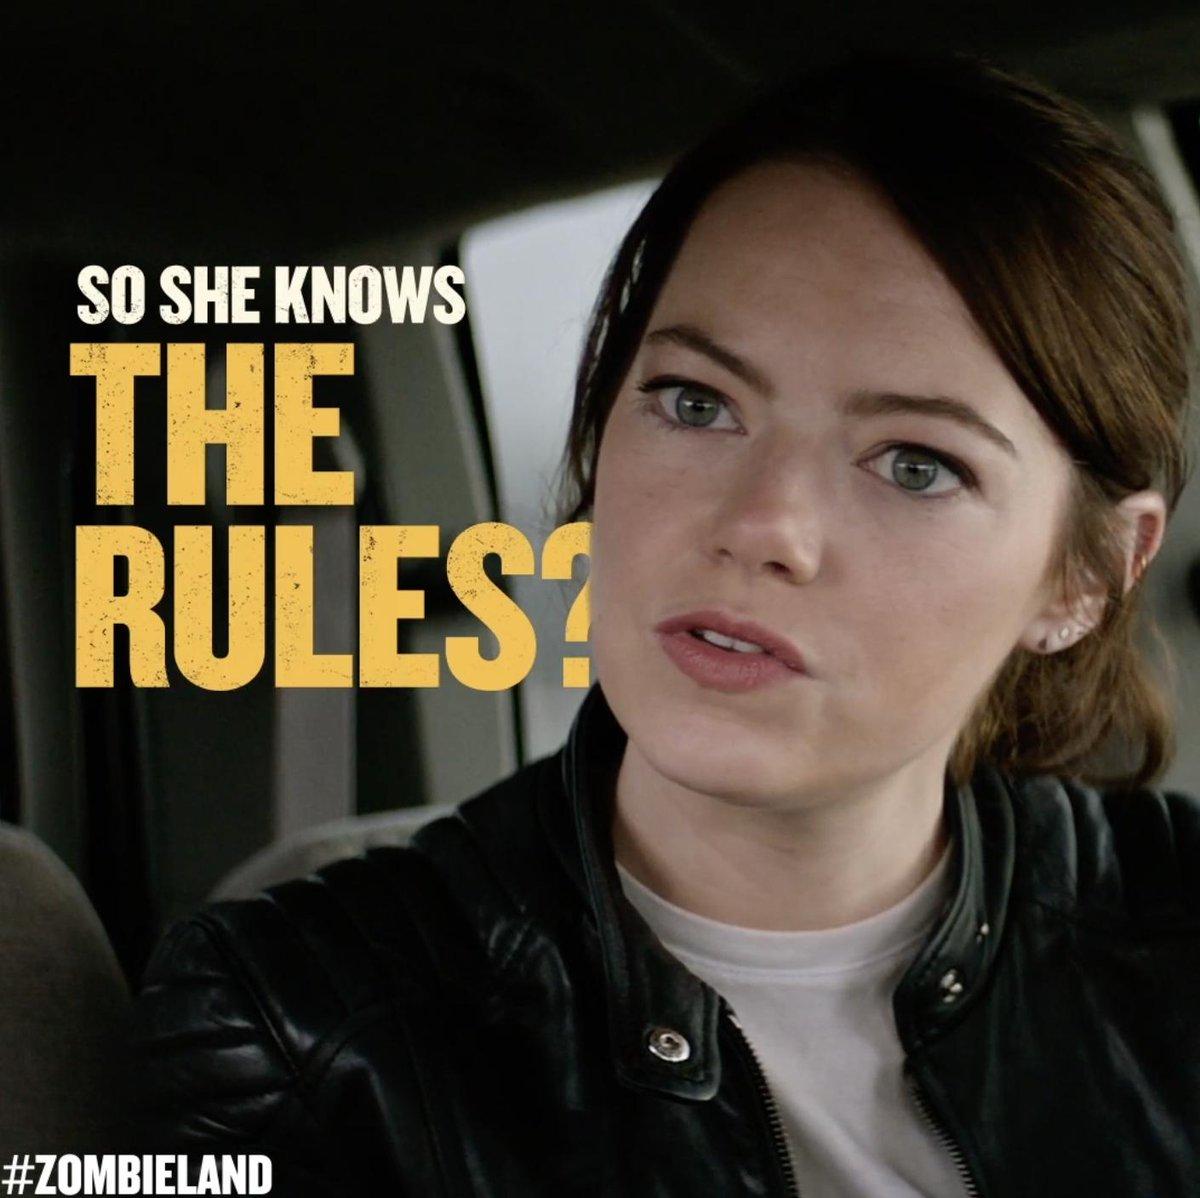 Seatbelts save lives. #Zombieland 10.18.19